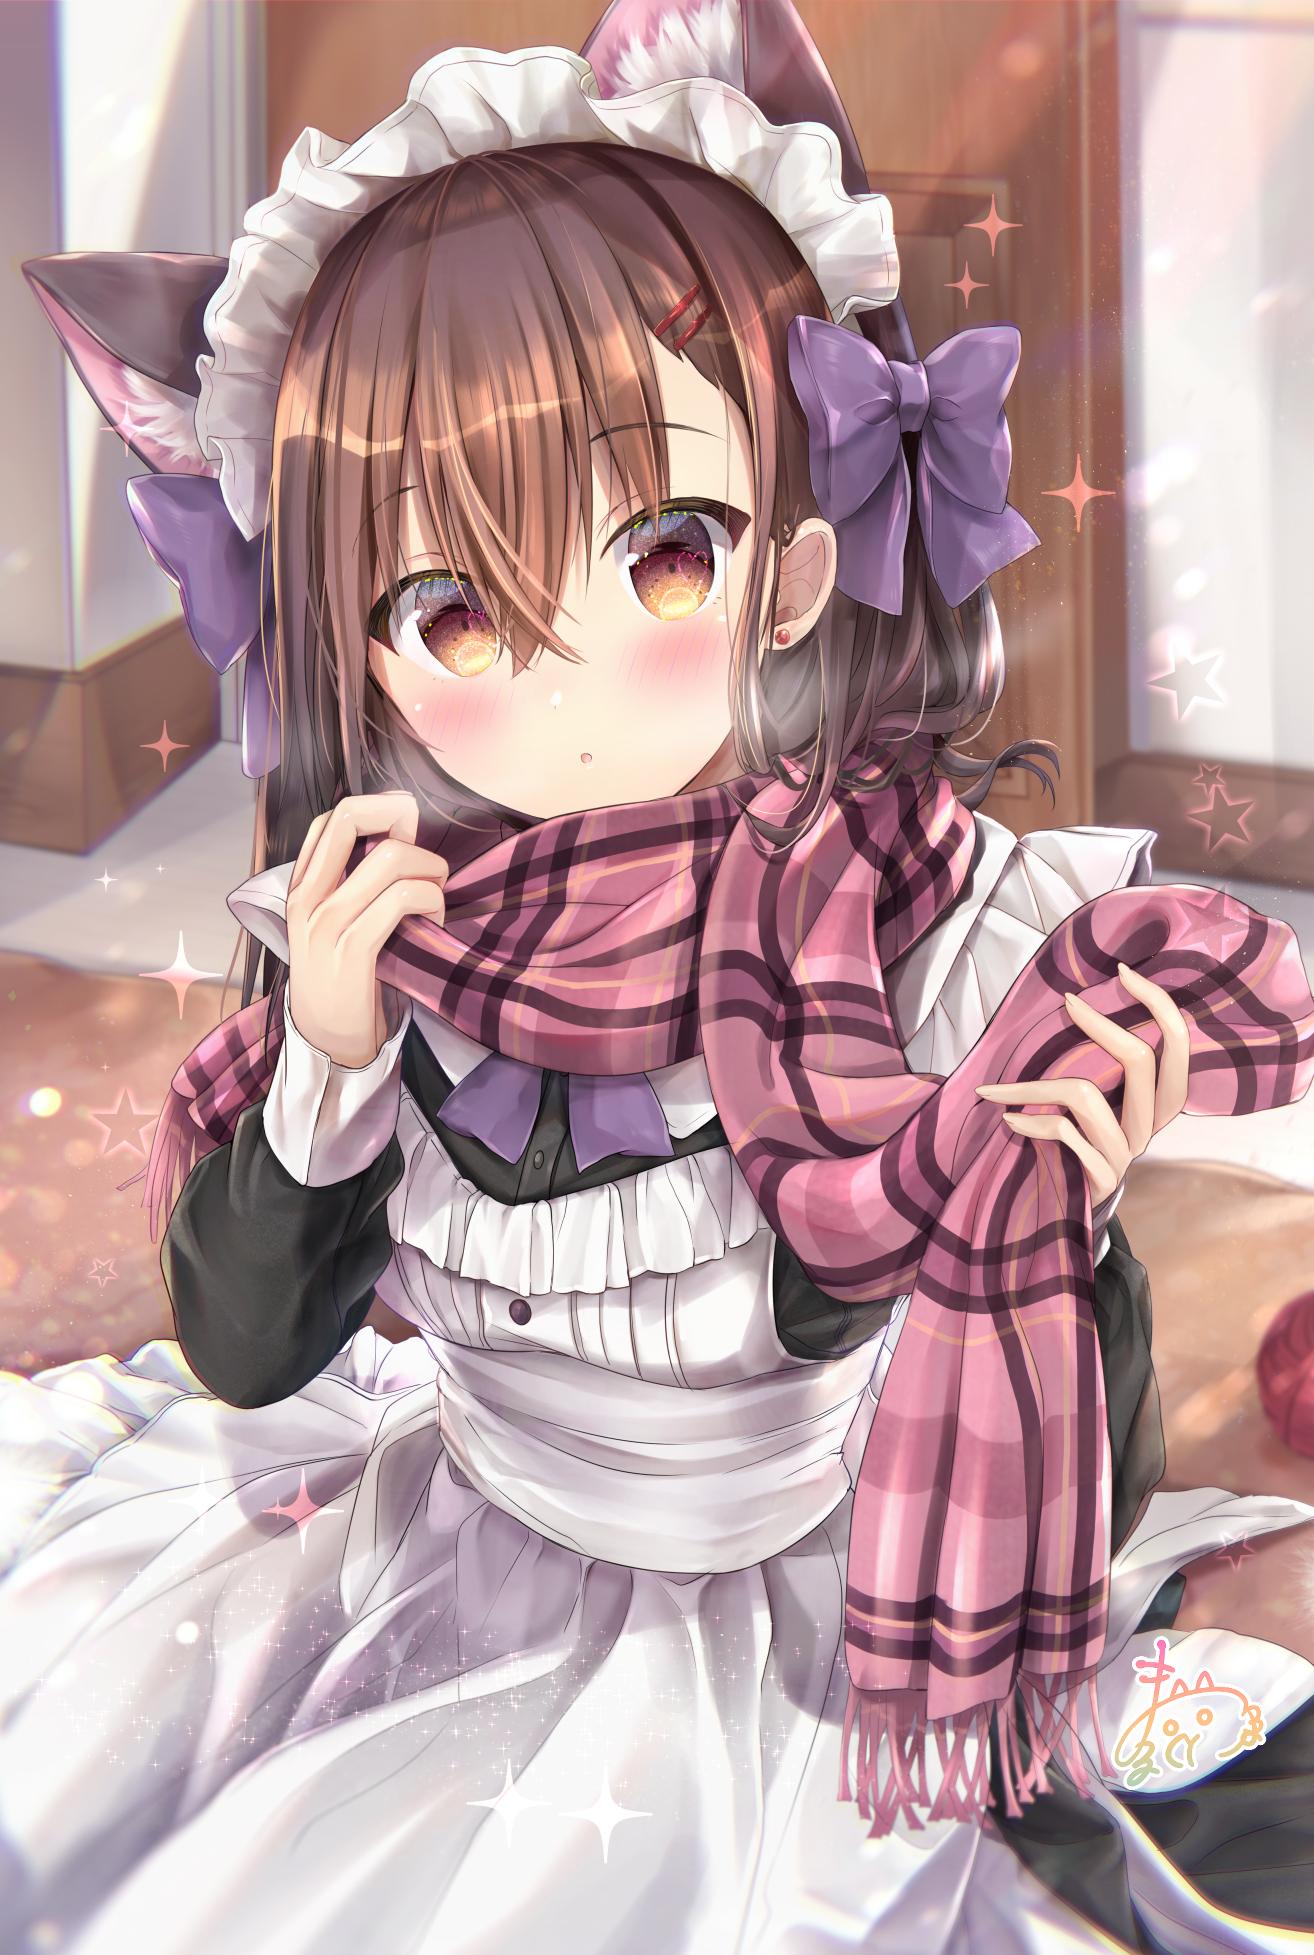 Anime 1314x1955 anime anime girls digital art artwork 2D portrait display vertical Maruma animal ears cat girl brunette brown eyes blush scarf maid outfit